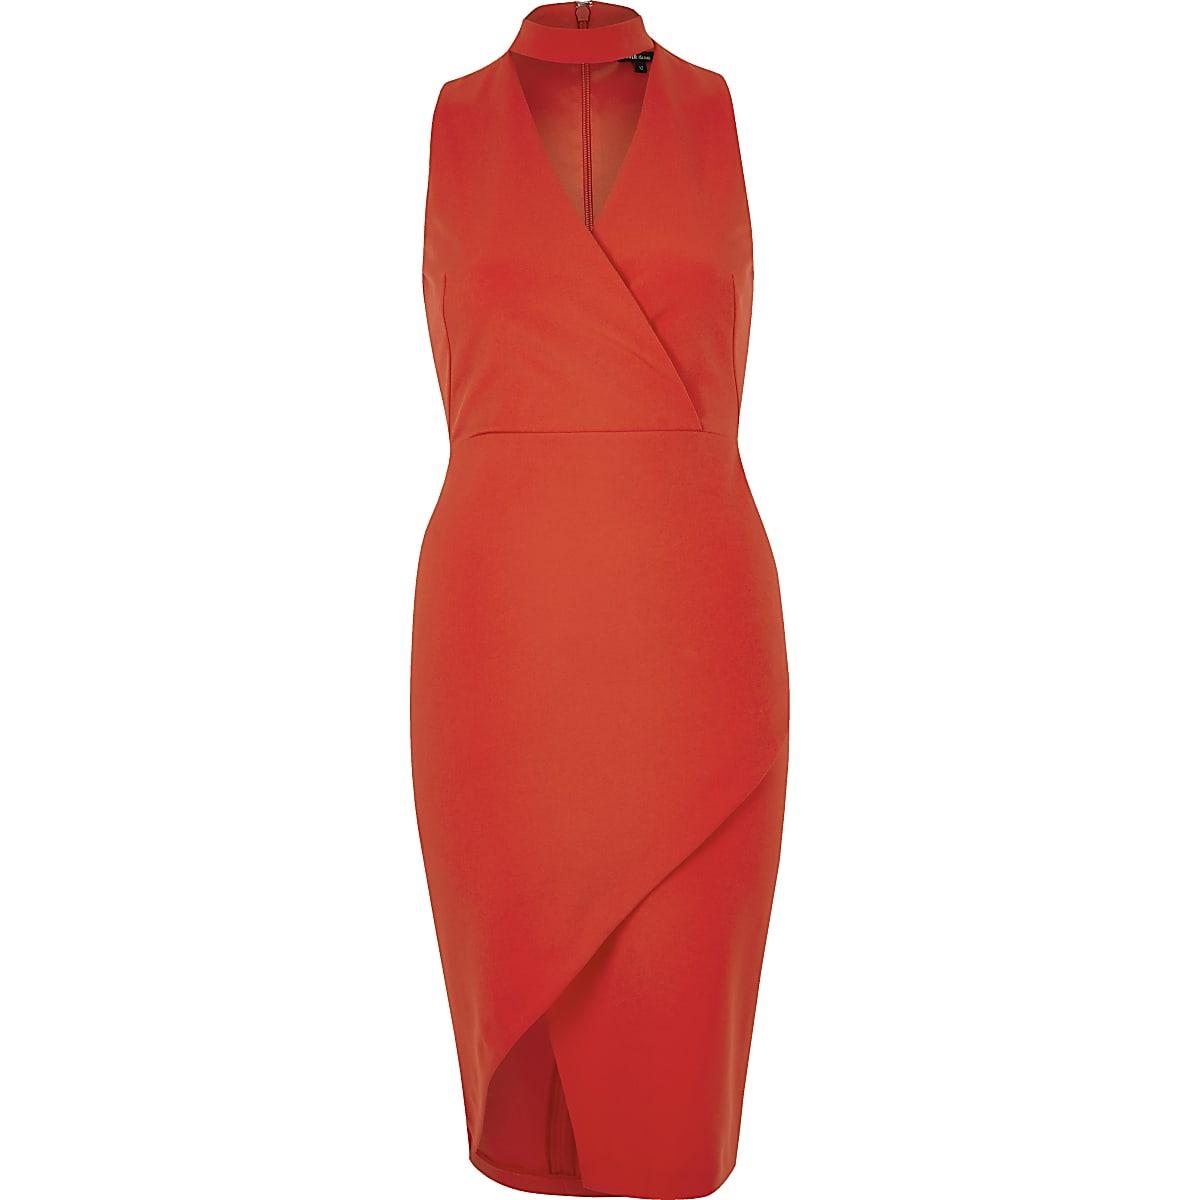 954c45a9e60abf Red wrap choker bodycon dress